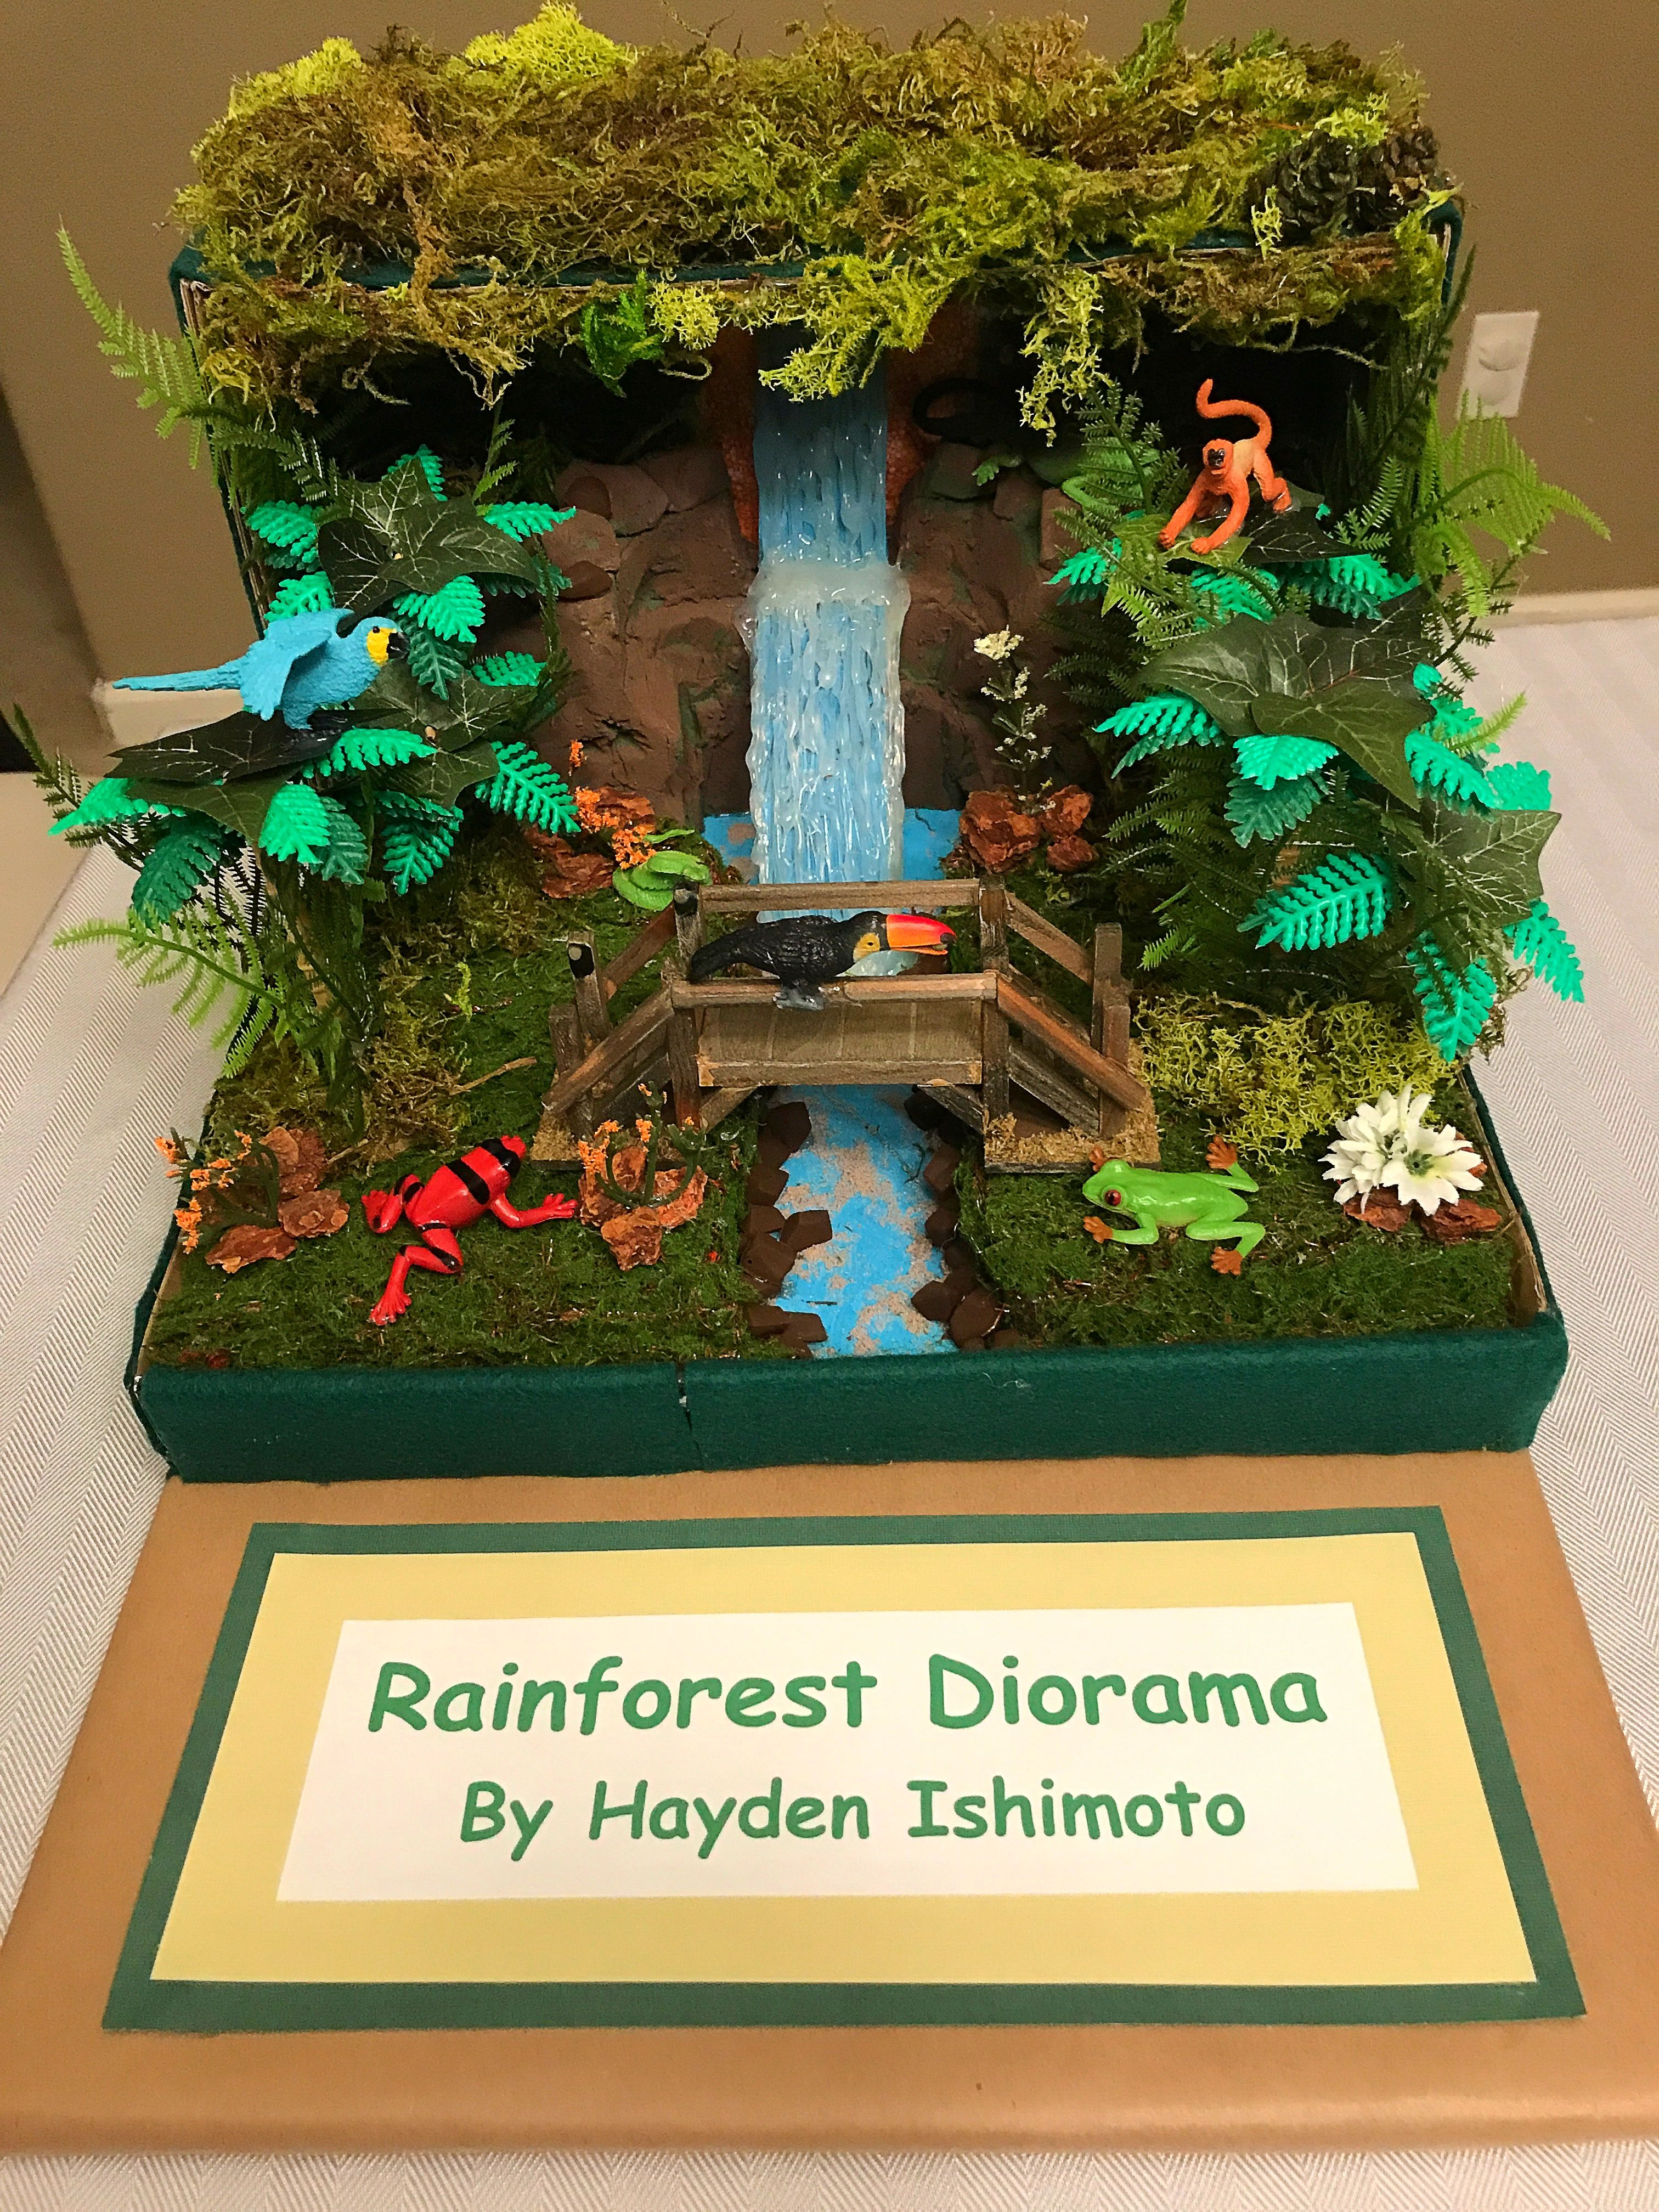 Hayden S 3rd Grade Rainforest Diorama With Images